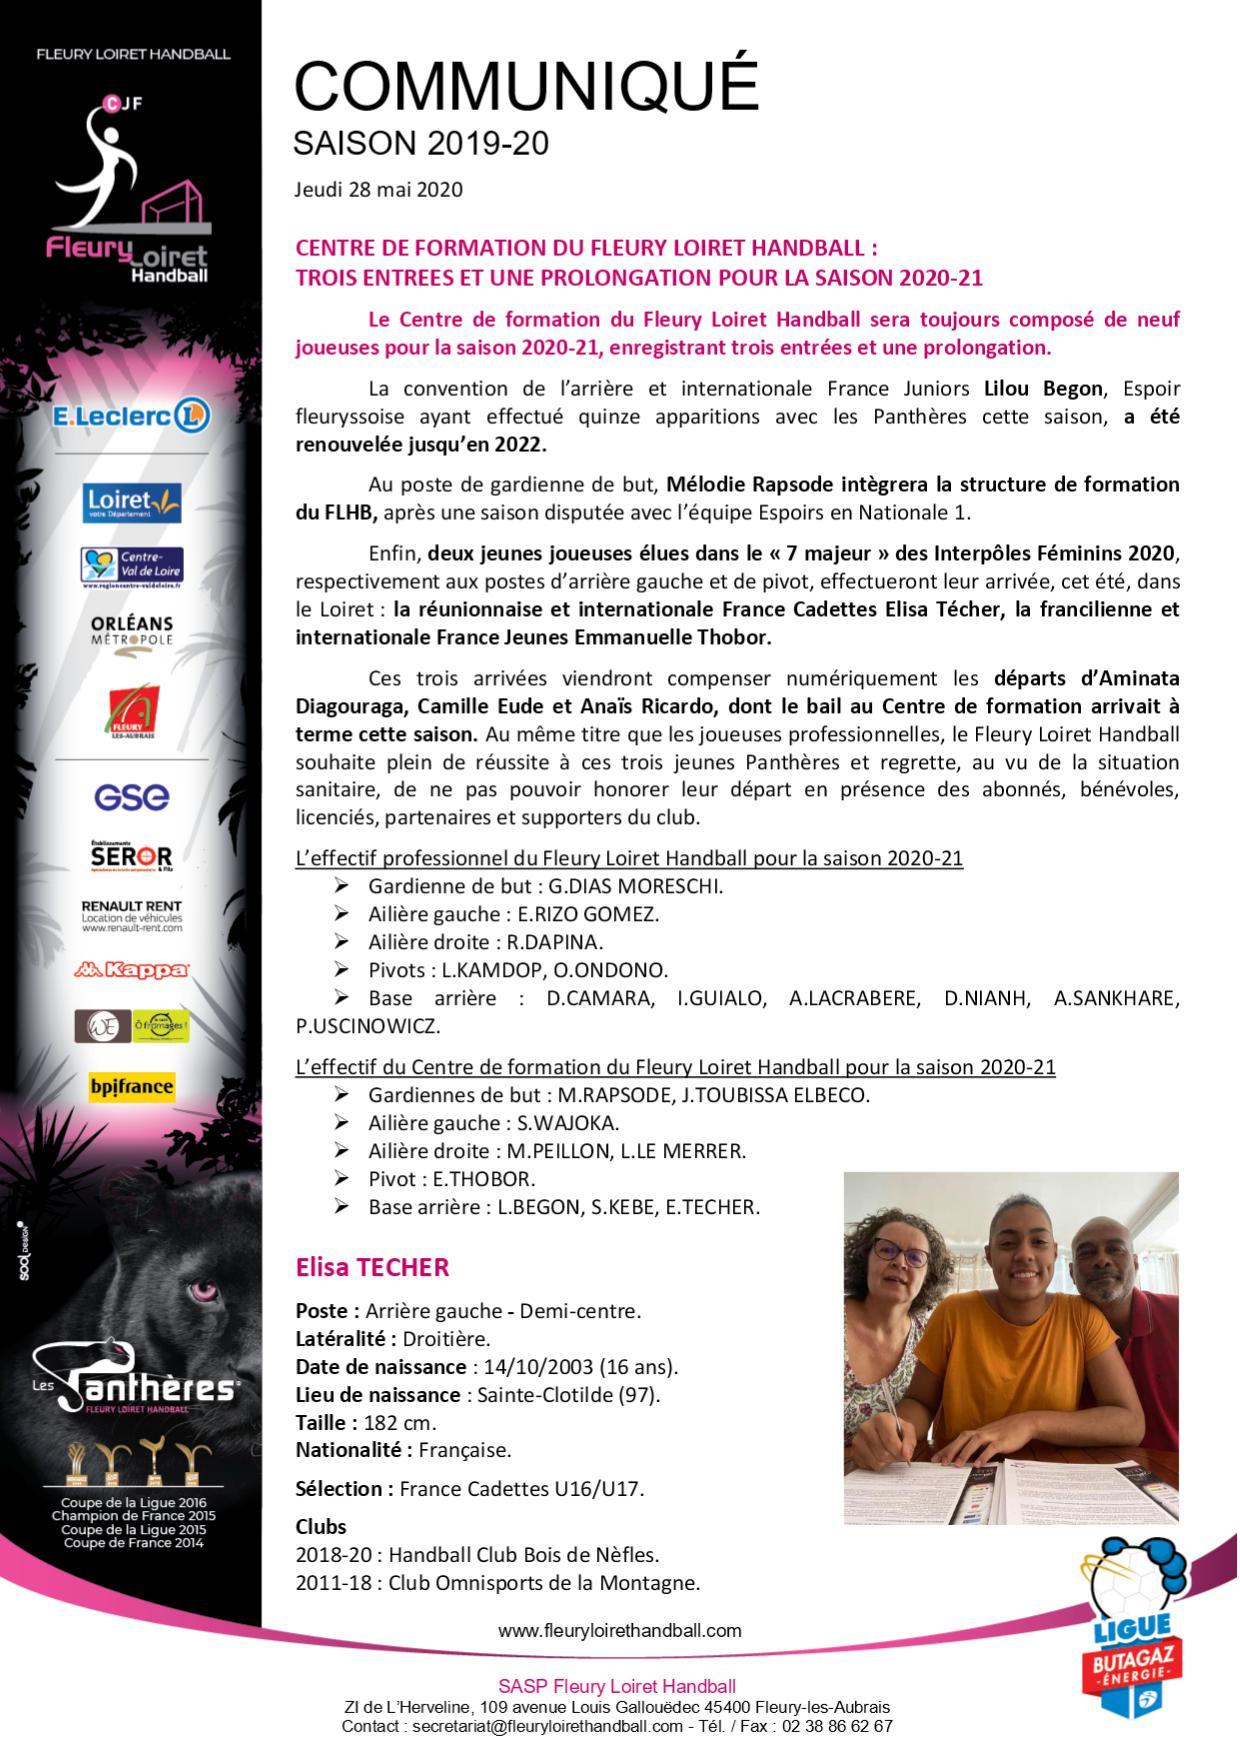 Aout 2015 - Communiqué Fleury Loiret Handball - Jeudi 28 mai 20201.jpg